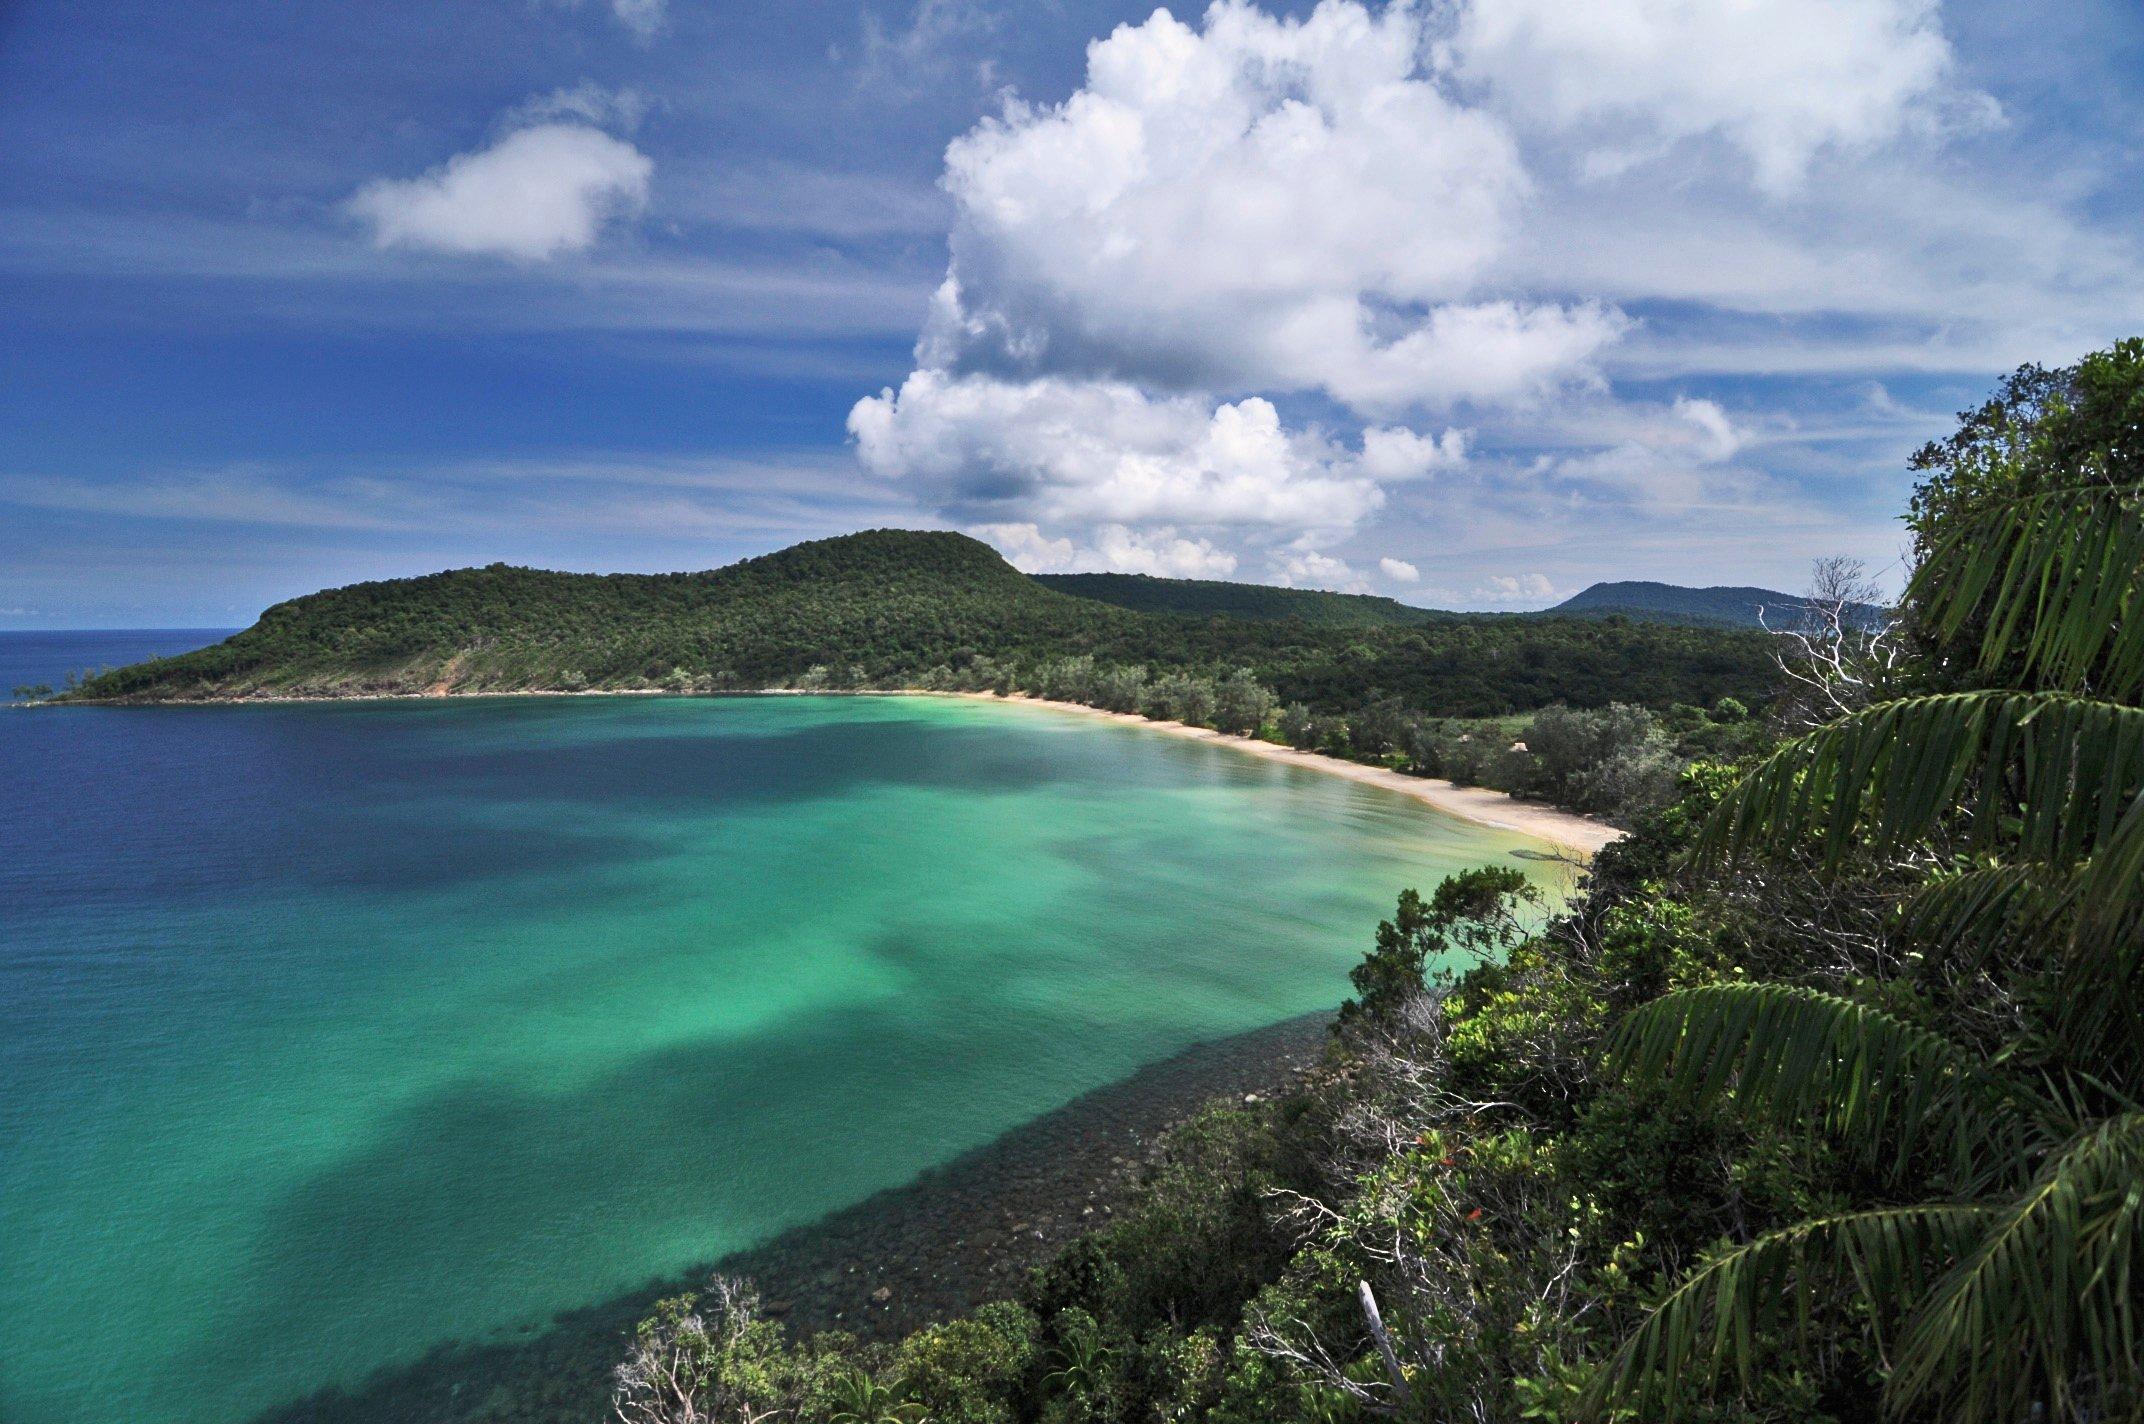 A majestic summer landscapes in Cambodia's beach